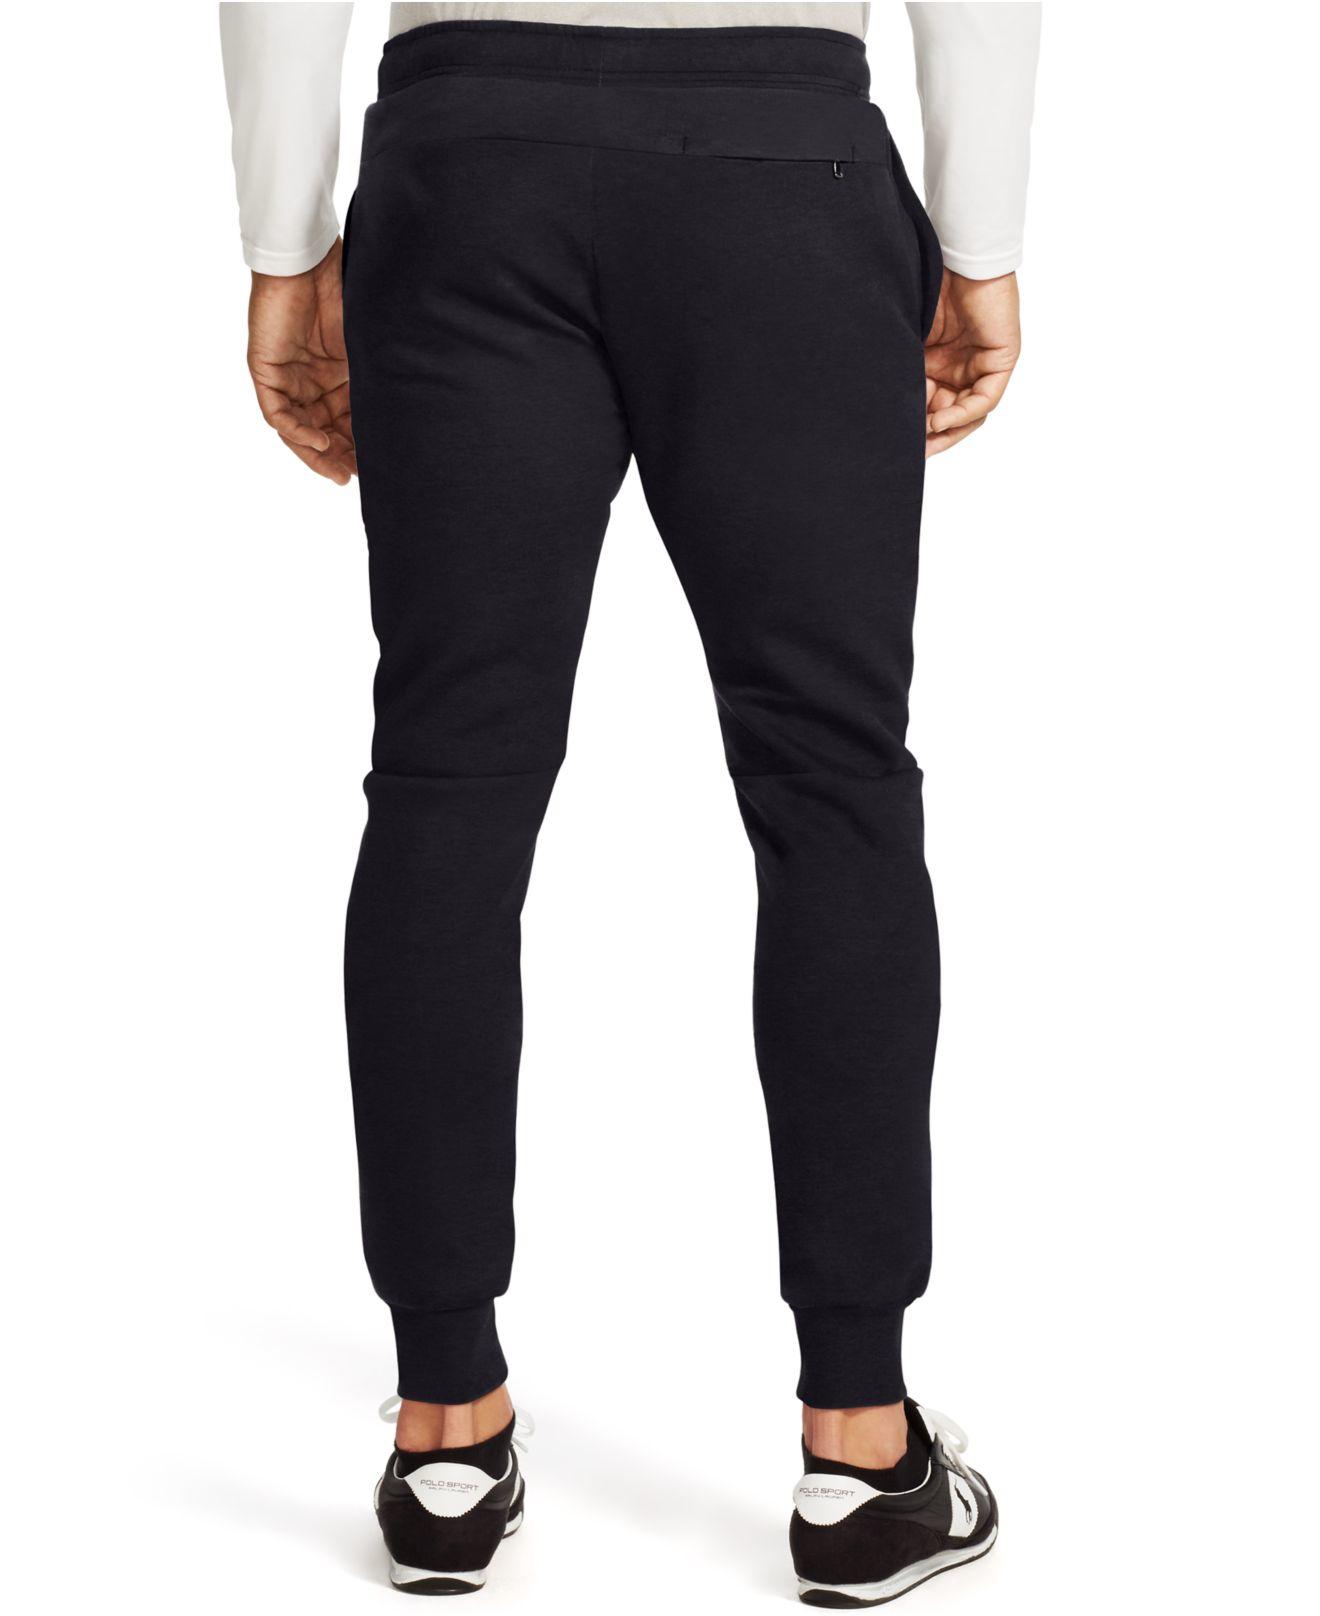 4833317e587d Lyst - Polo Ralph Lauren Double-knit Tech Pants in Black for Men